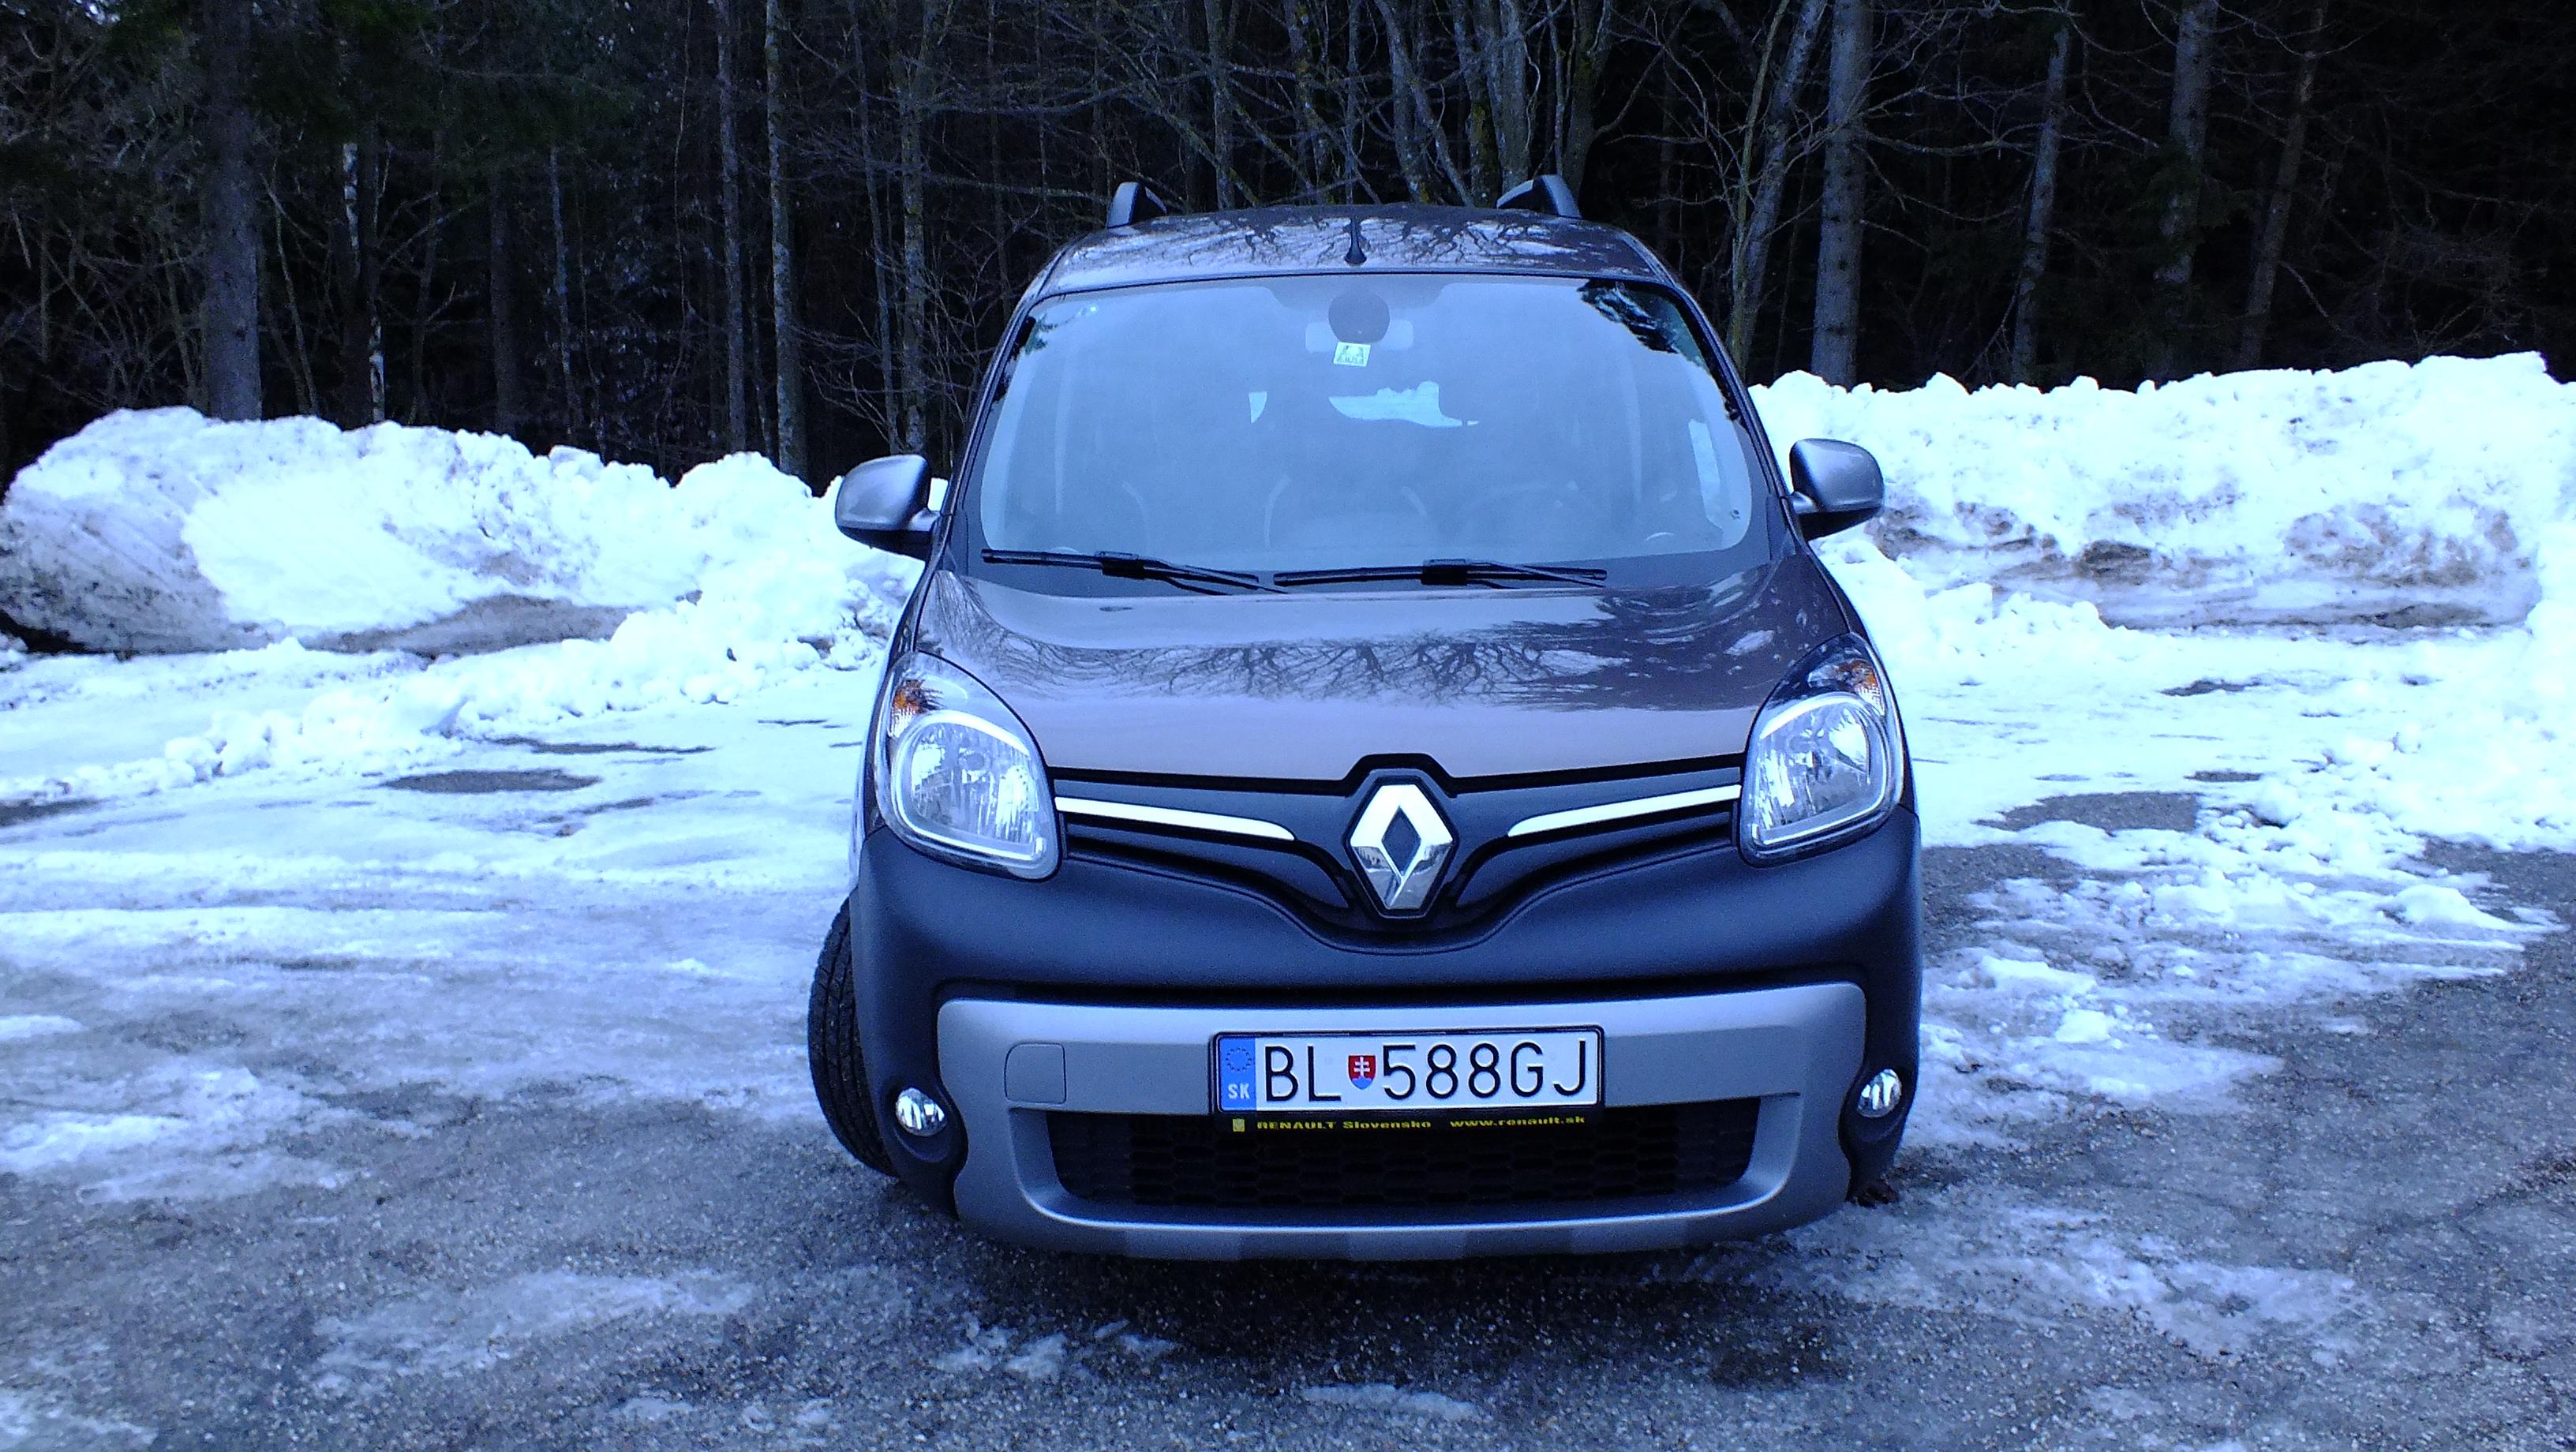 Renault Kangoo 1.5 dCi 66kW